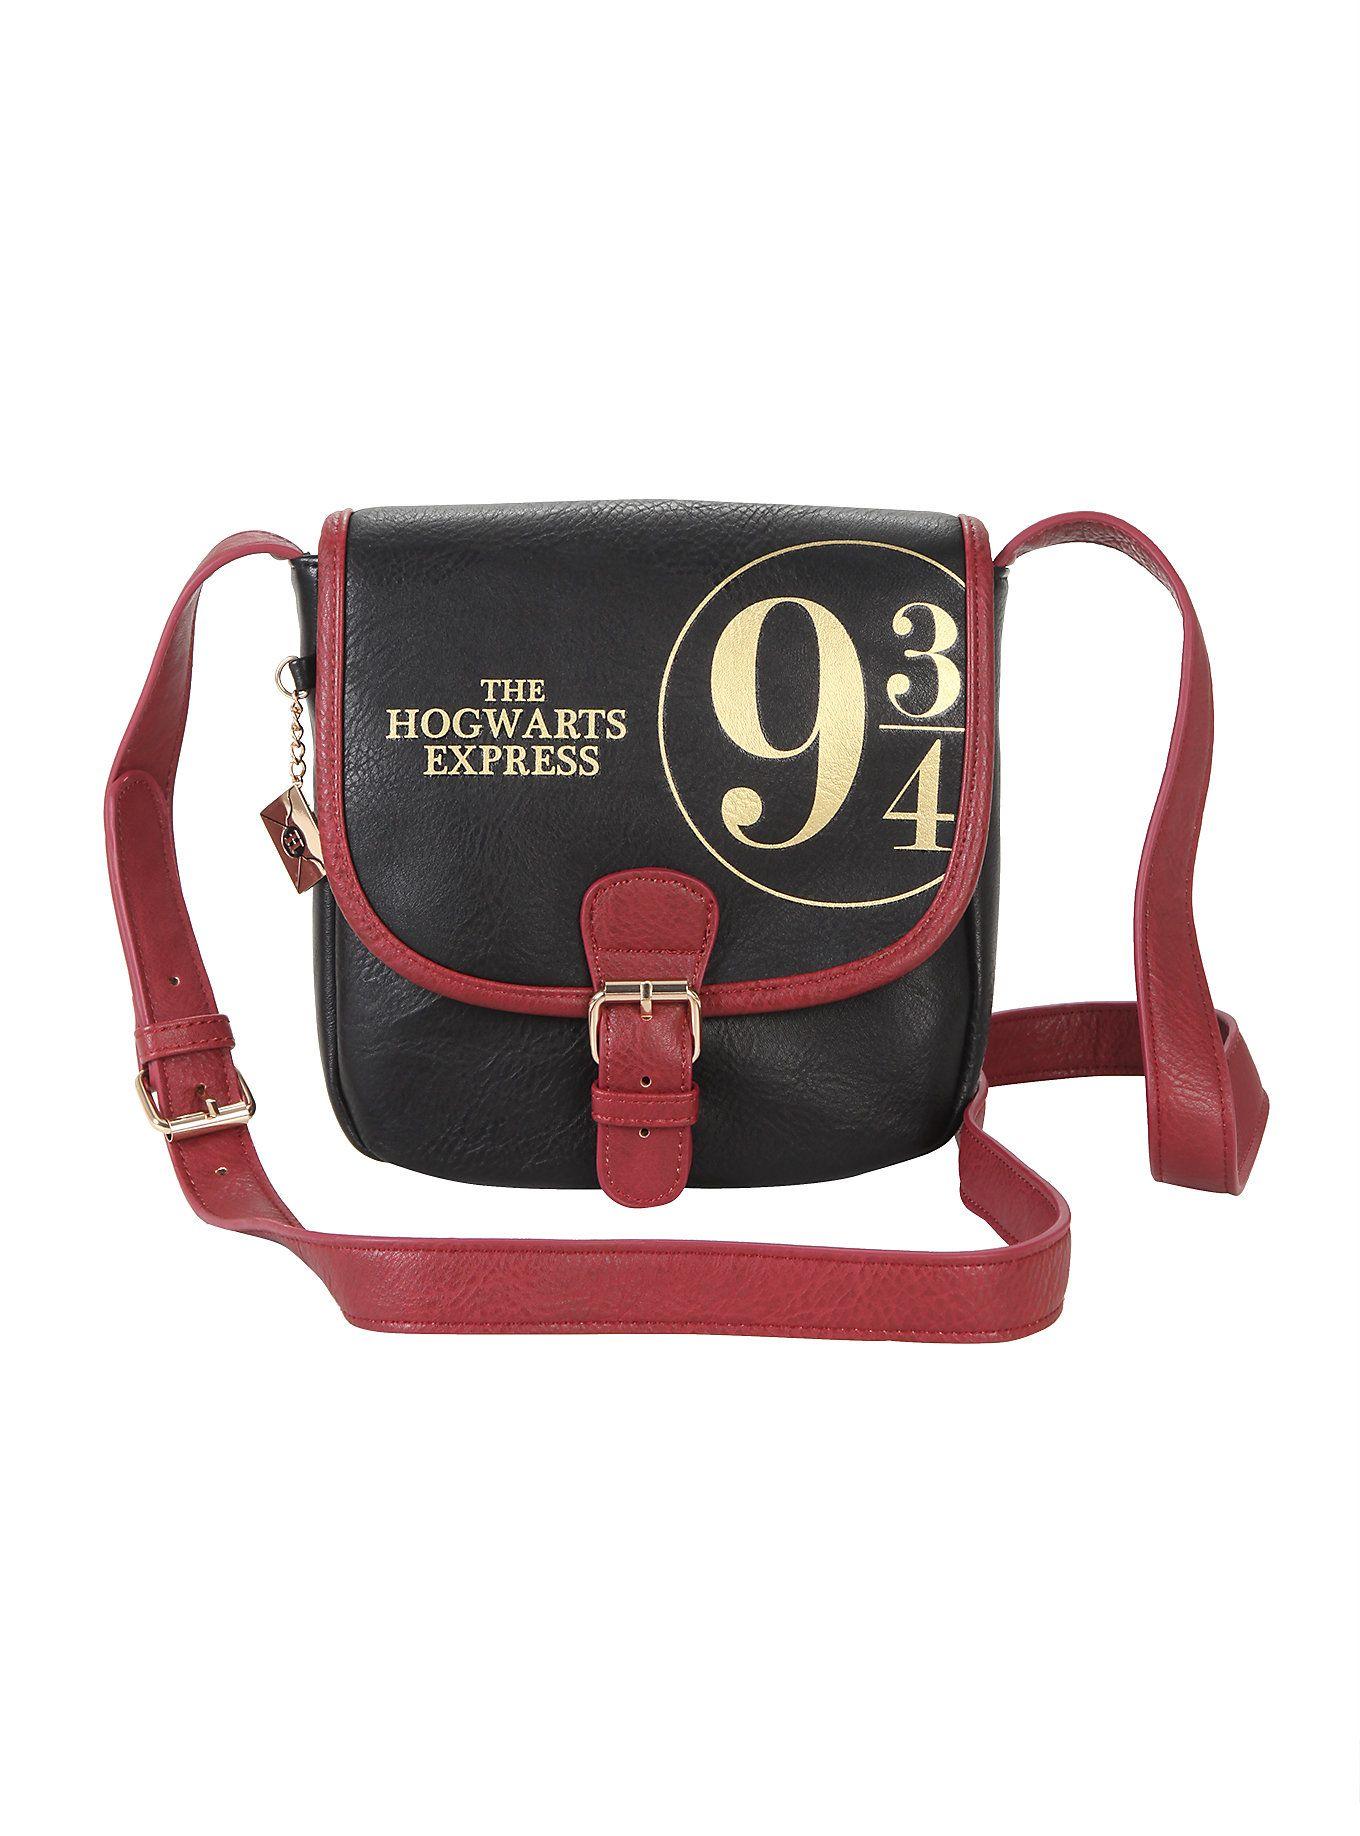 Harry Potter Platform 9 3 4 Crossbody Bag  c3020b12d32f0